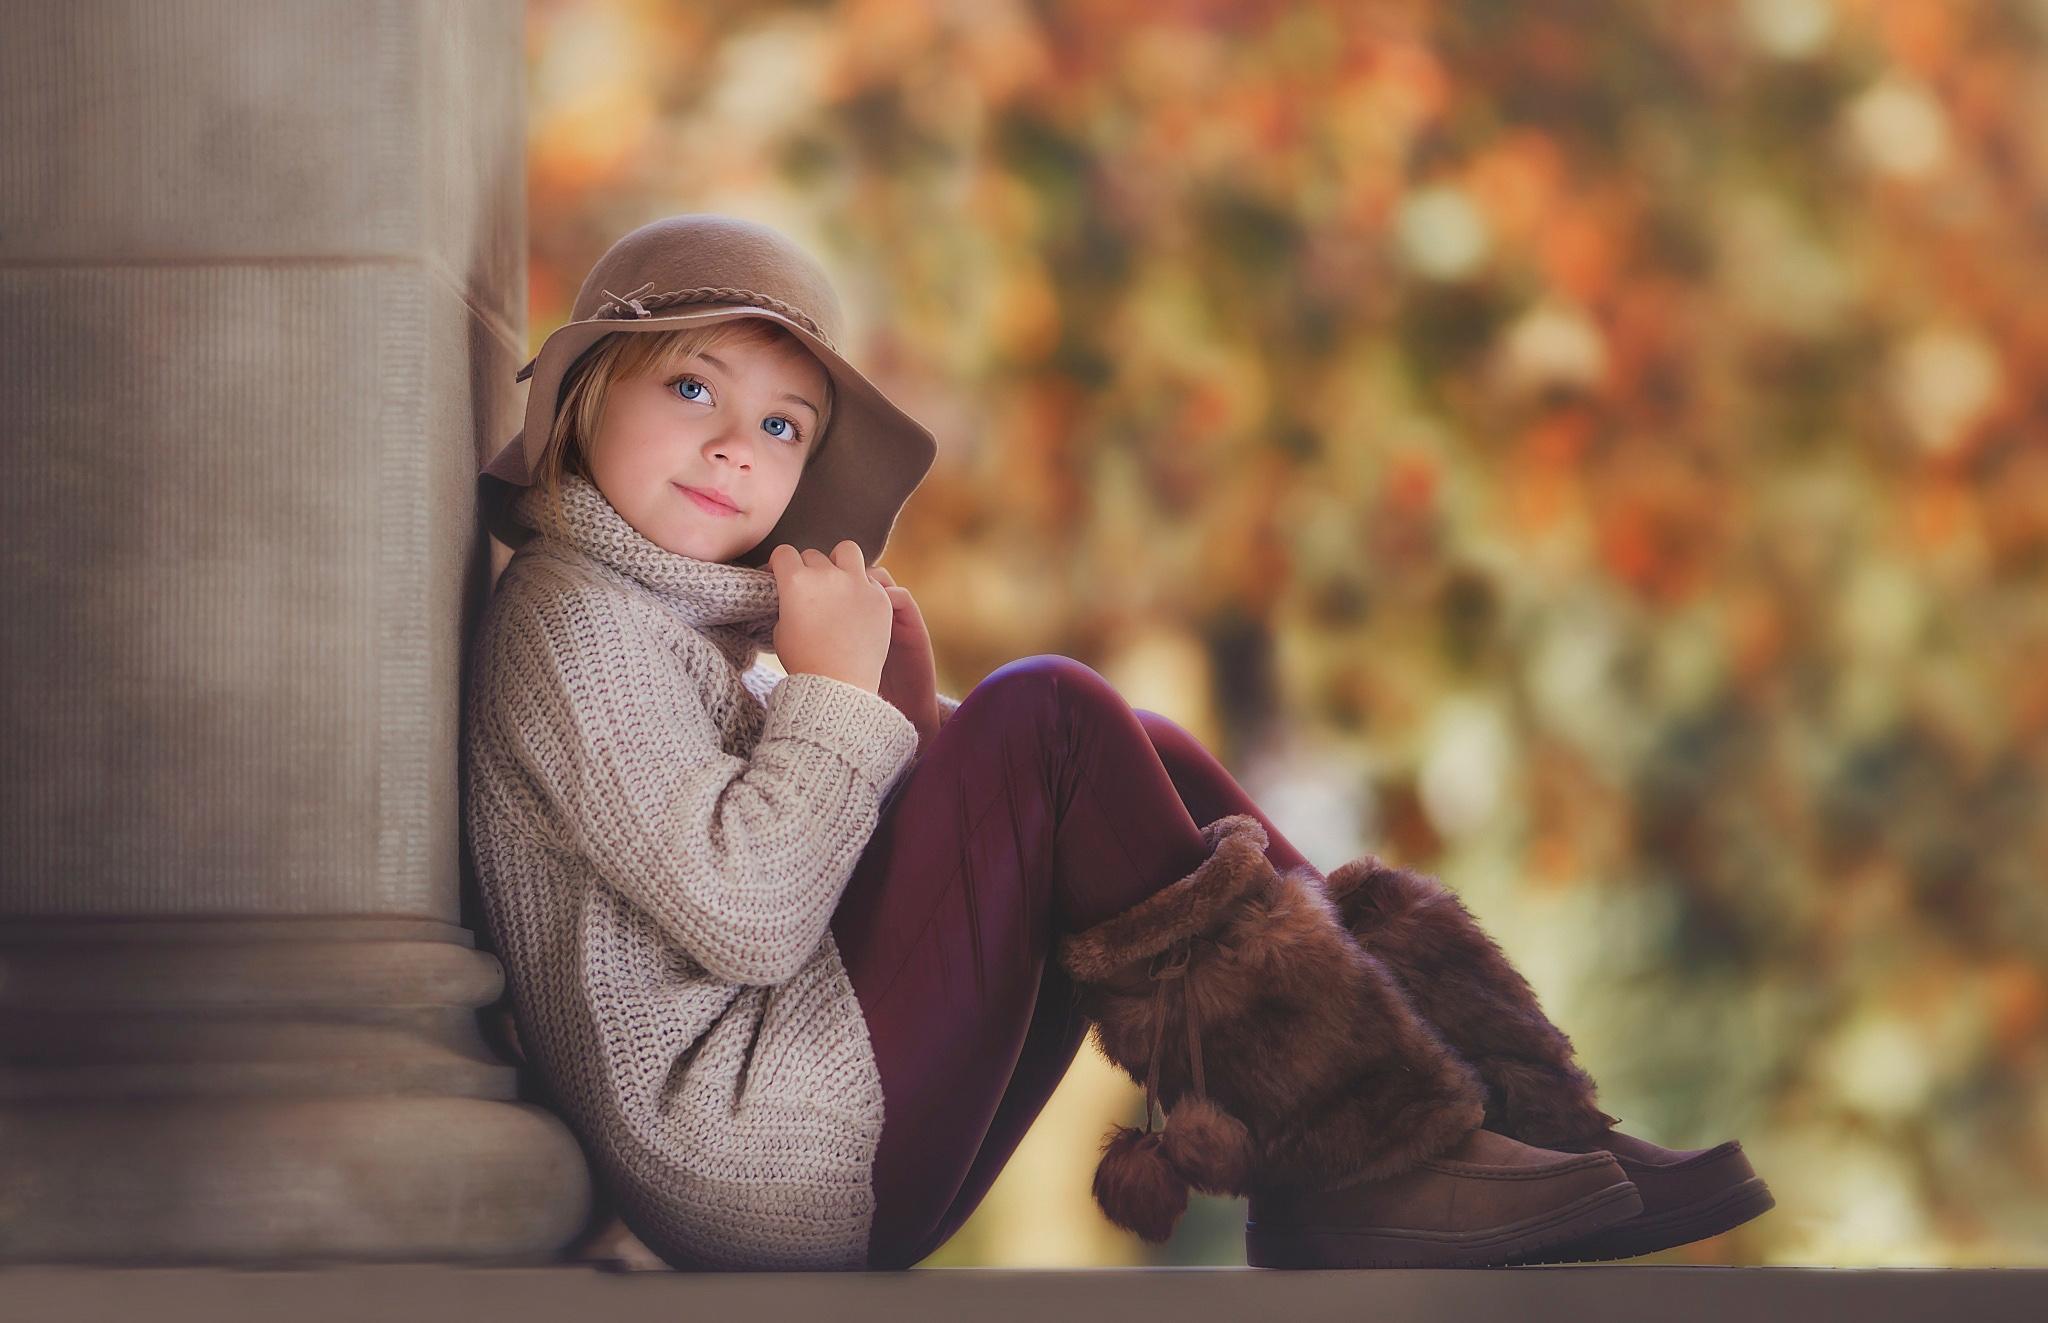 Sad Small Girl Wallpapers صور بنات صغار 2016 جميلة ورقيقة احلي بنات صغيرة سوبر كايرو